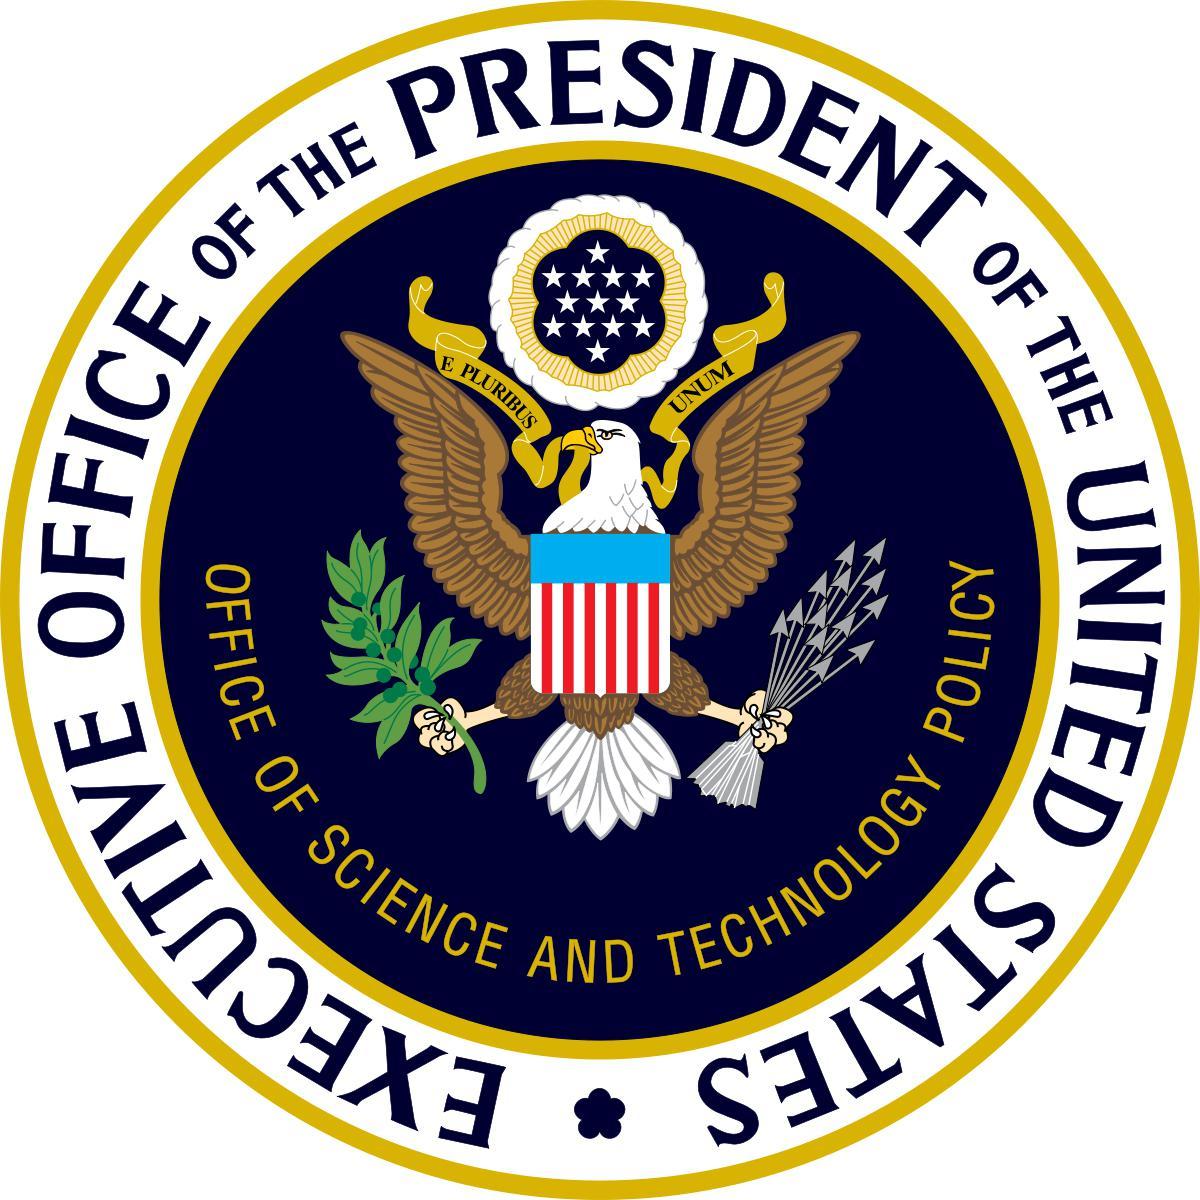 4 CT teachers earn presidential excellence awards